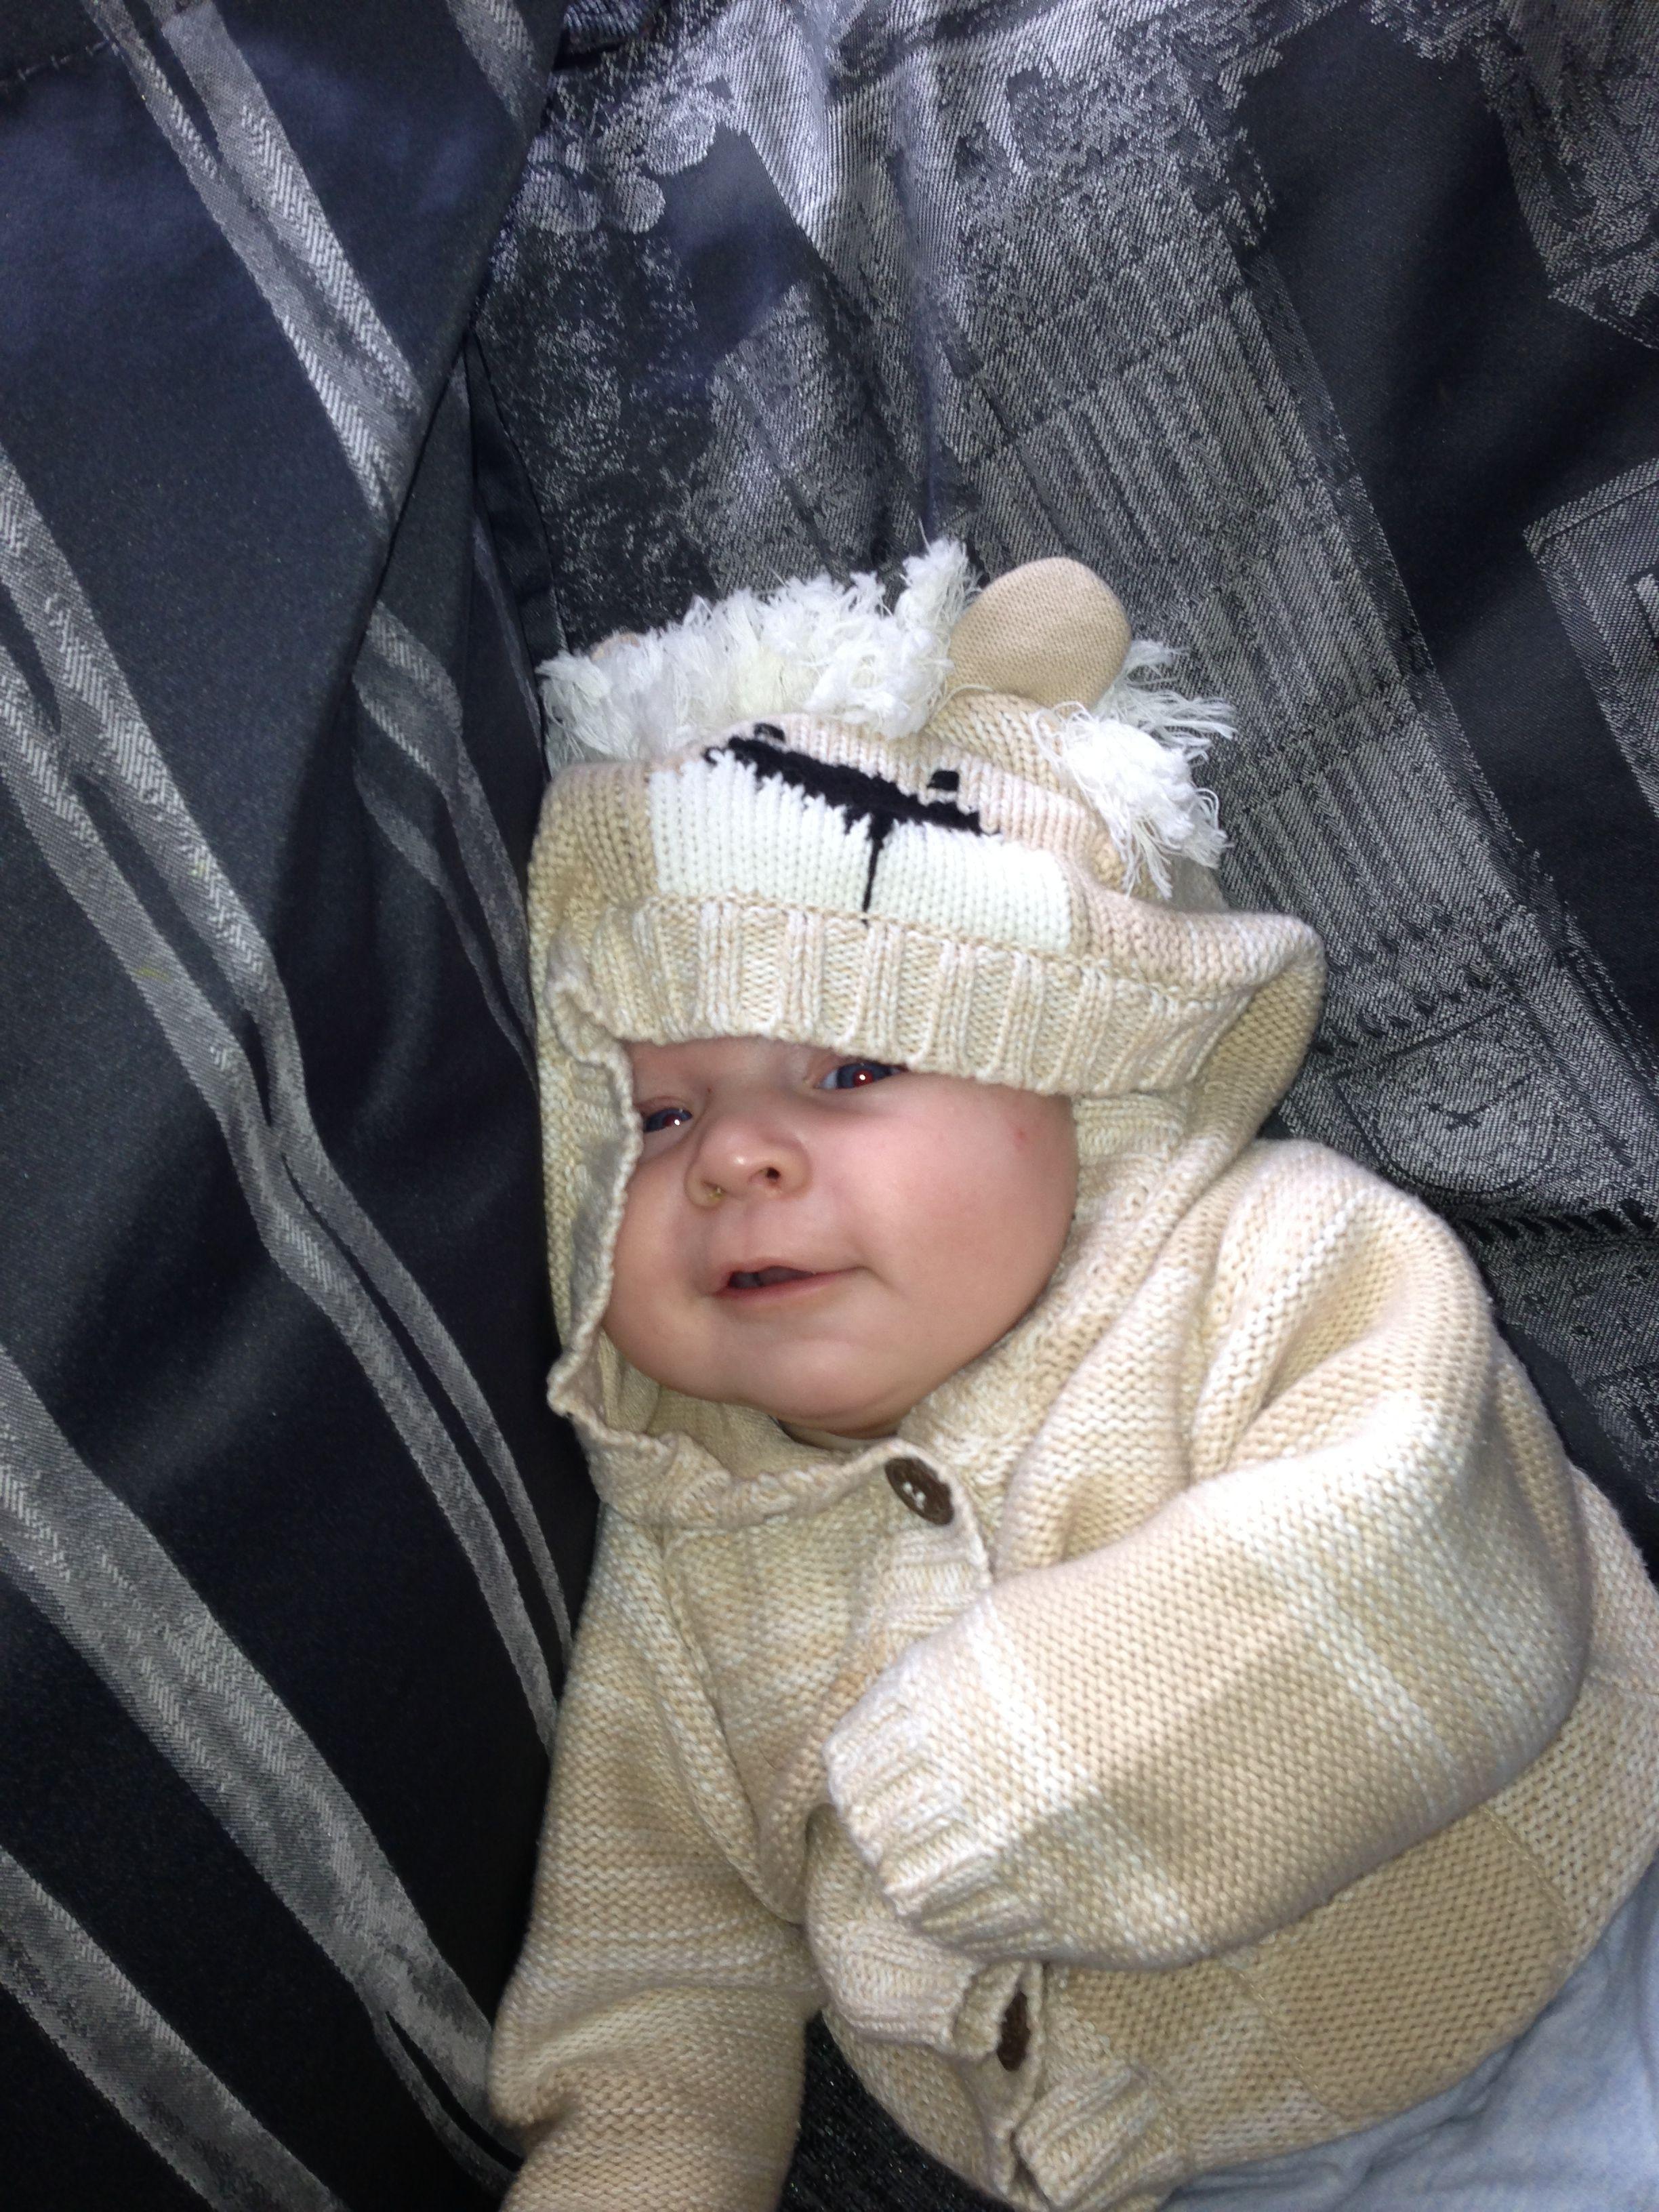 My lil baby boy jenson